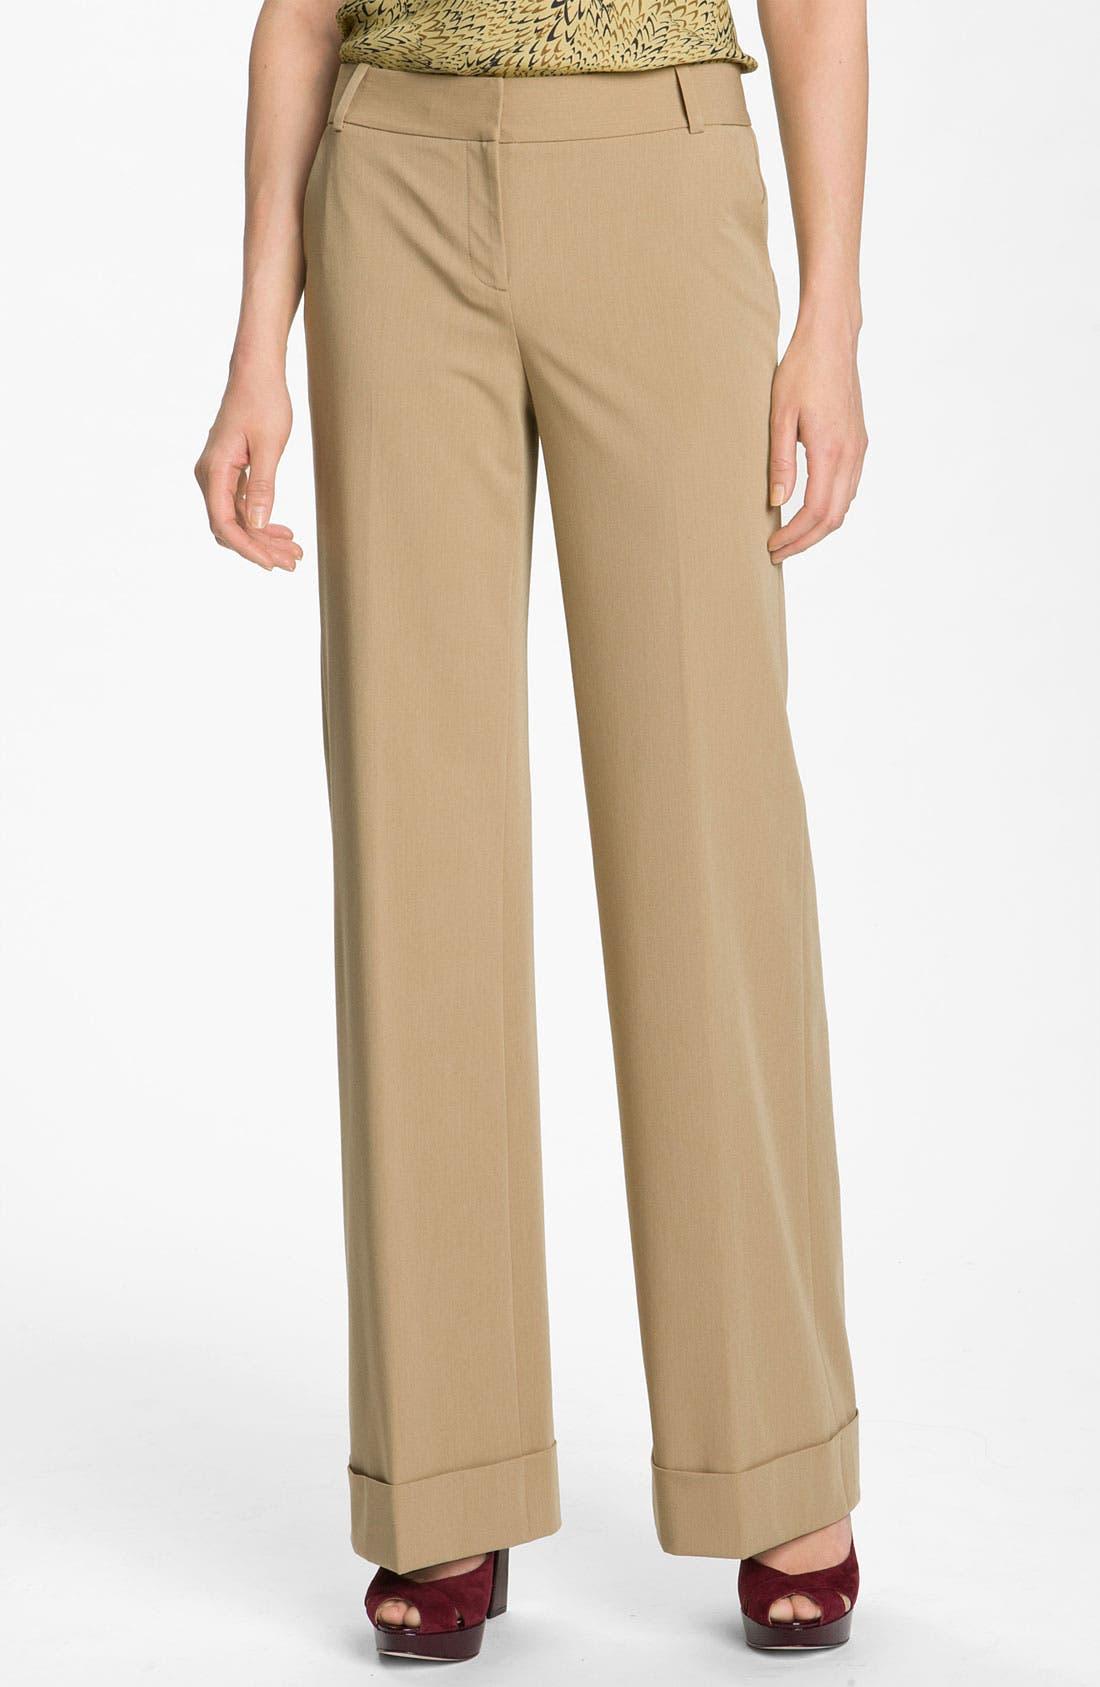 Alternate Image 1 Selected - Classiques Entier® 'Maxella' Cuff Pants